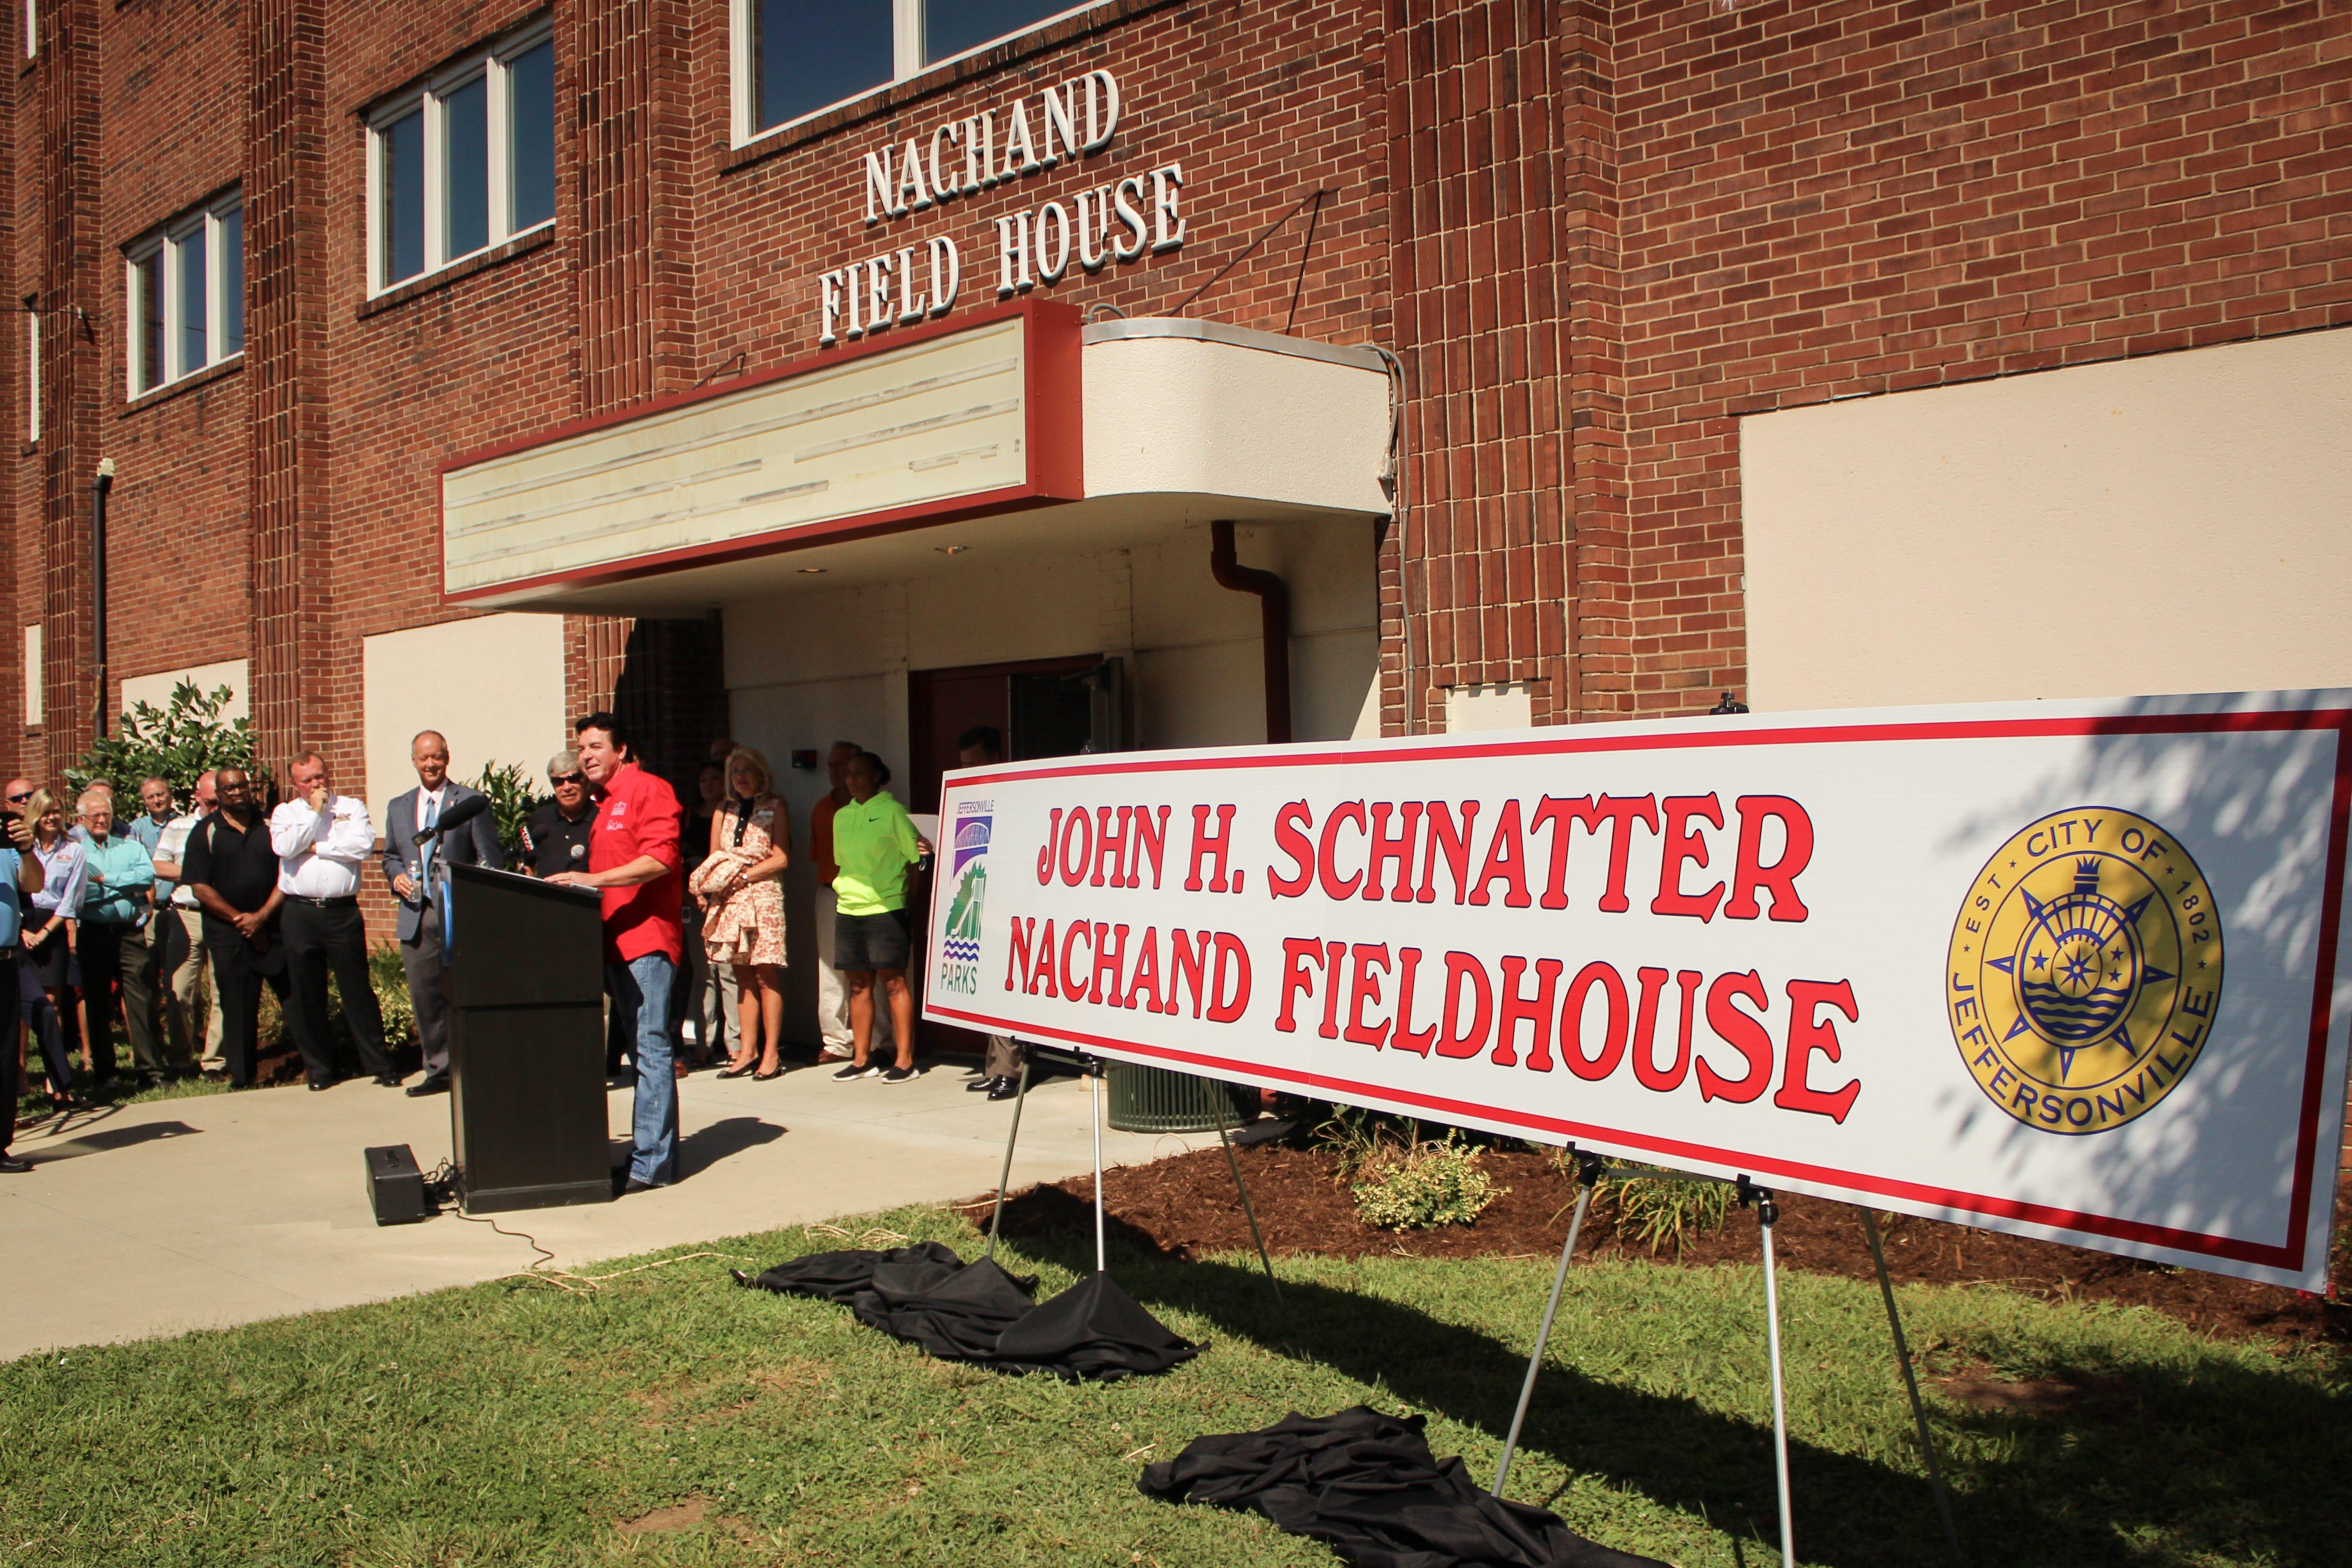 U0027Papa Johnu0027 Schnatter Pledges $800K To Restore Hometown Basketball Gym